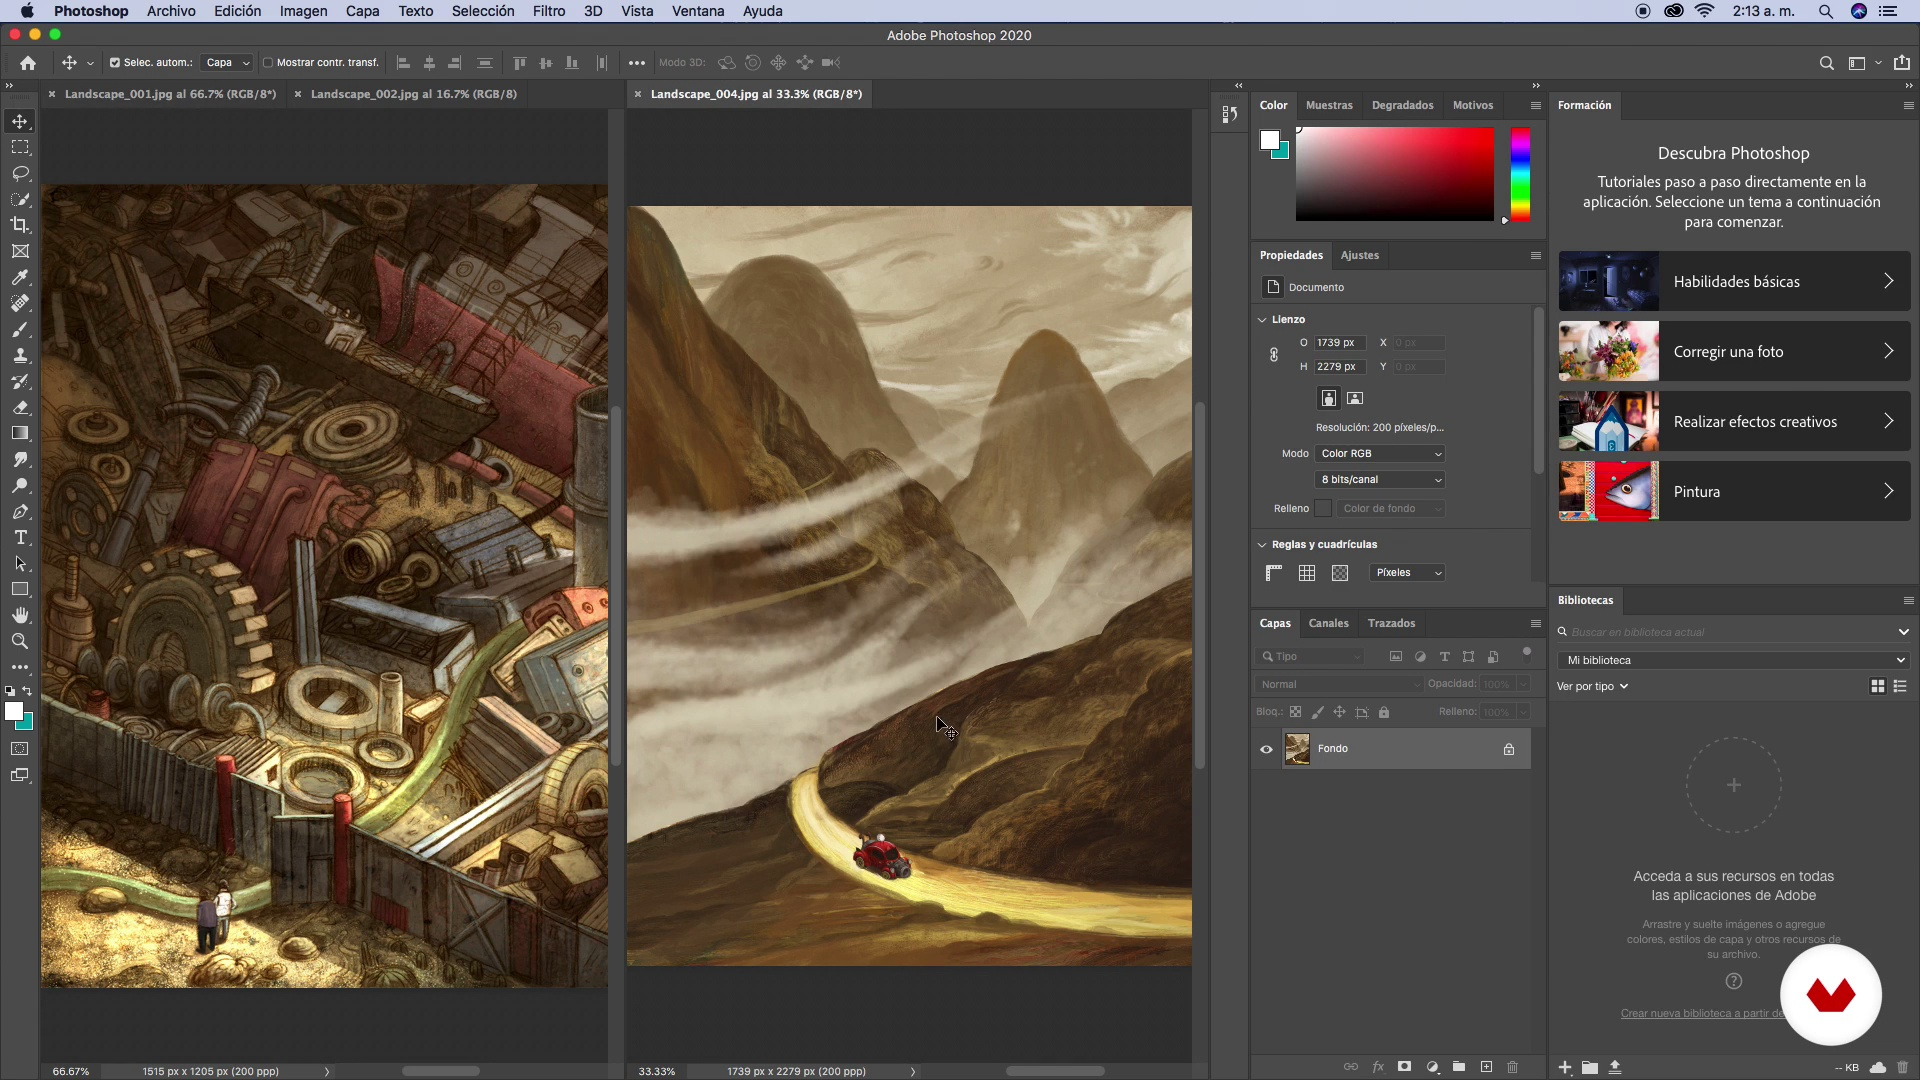 ibt-pep.de - Tutorials, Video-Trainings, Workshops, Adobe Photoshop - Part 15